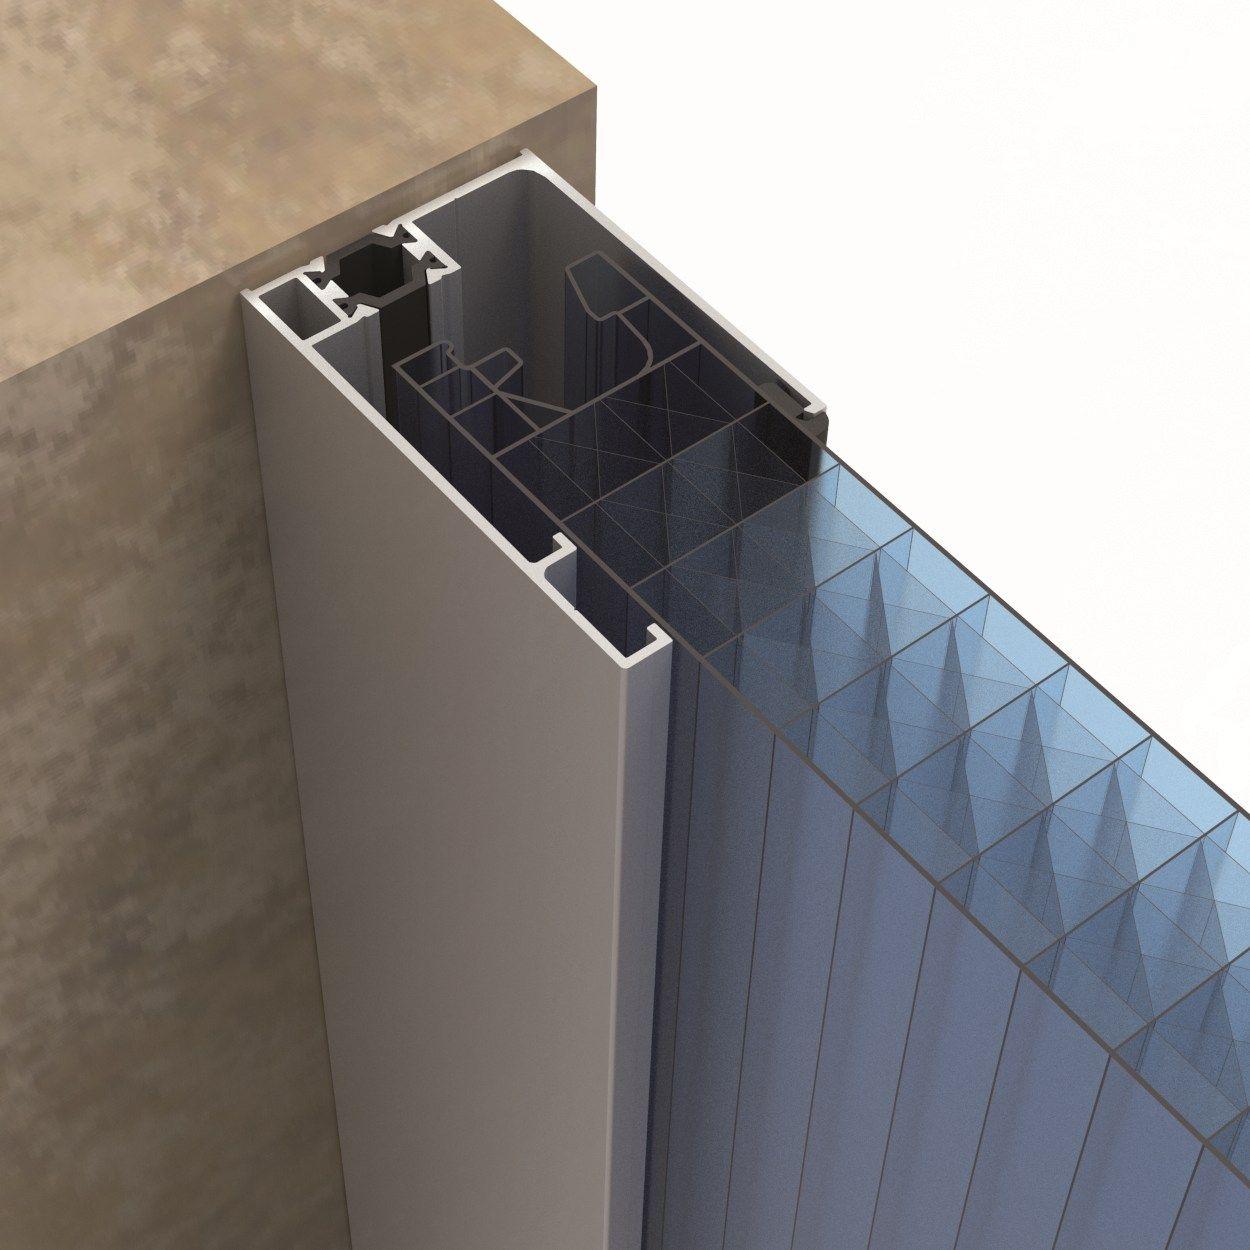 Exterior Home Design Software: Interlocking Polycarbonate System For Traslucent Facades